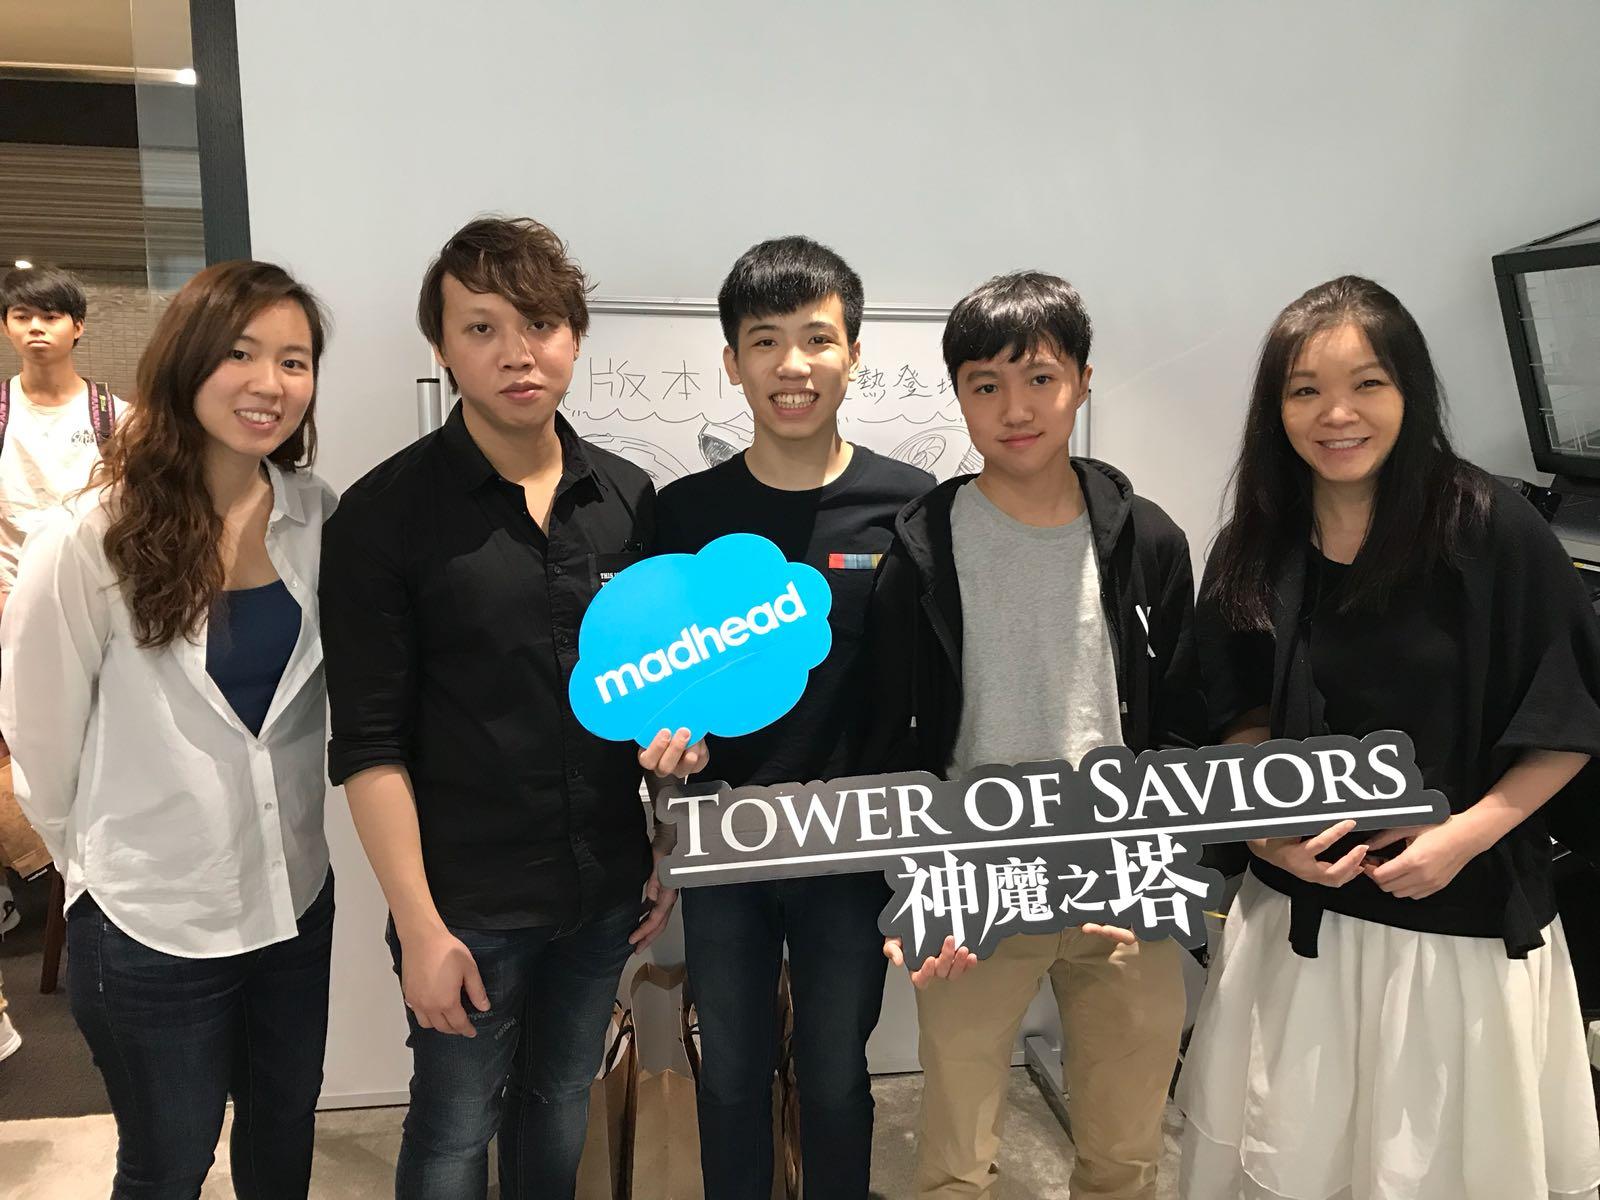 http://npc.edu.hk/sites/default/files/s_105521194.jpg